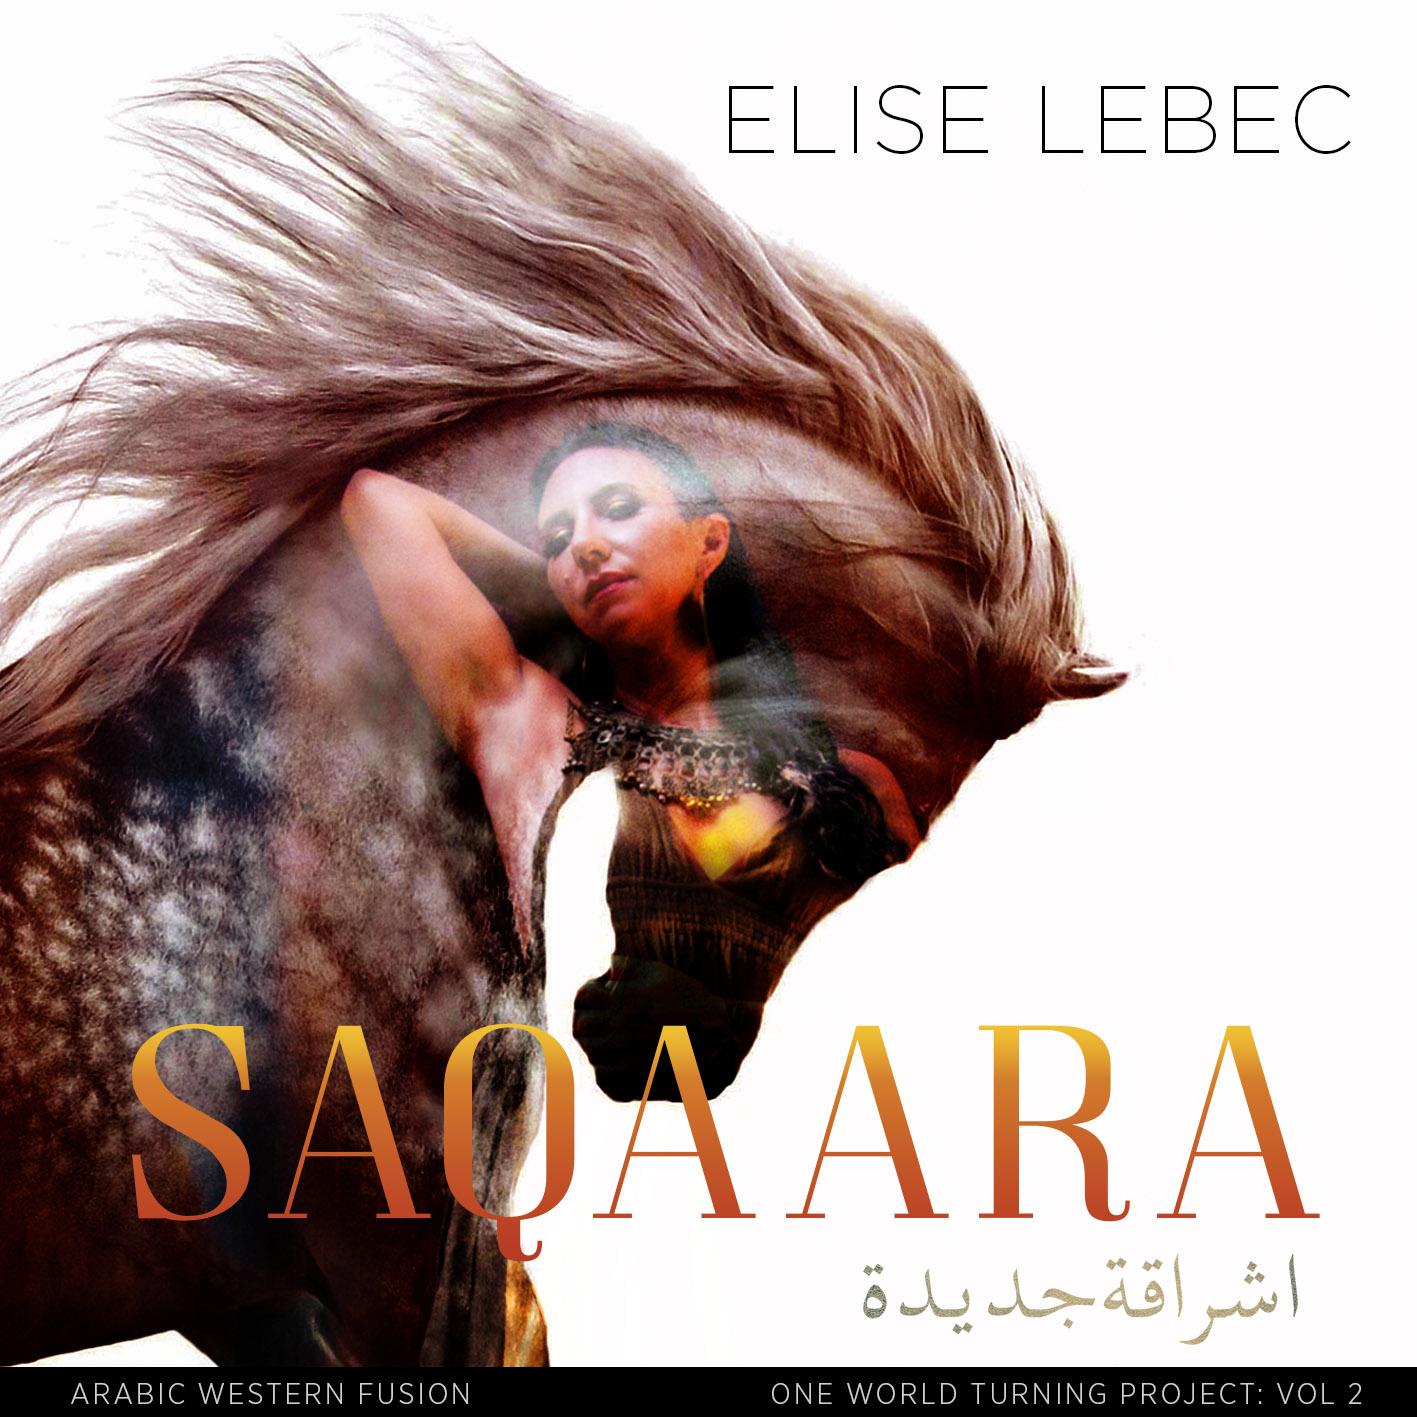 saqaara cover_rev 3.jpg